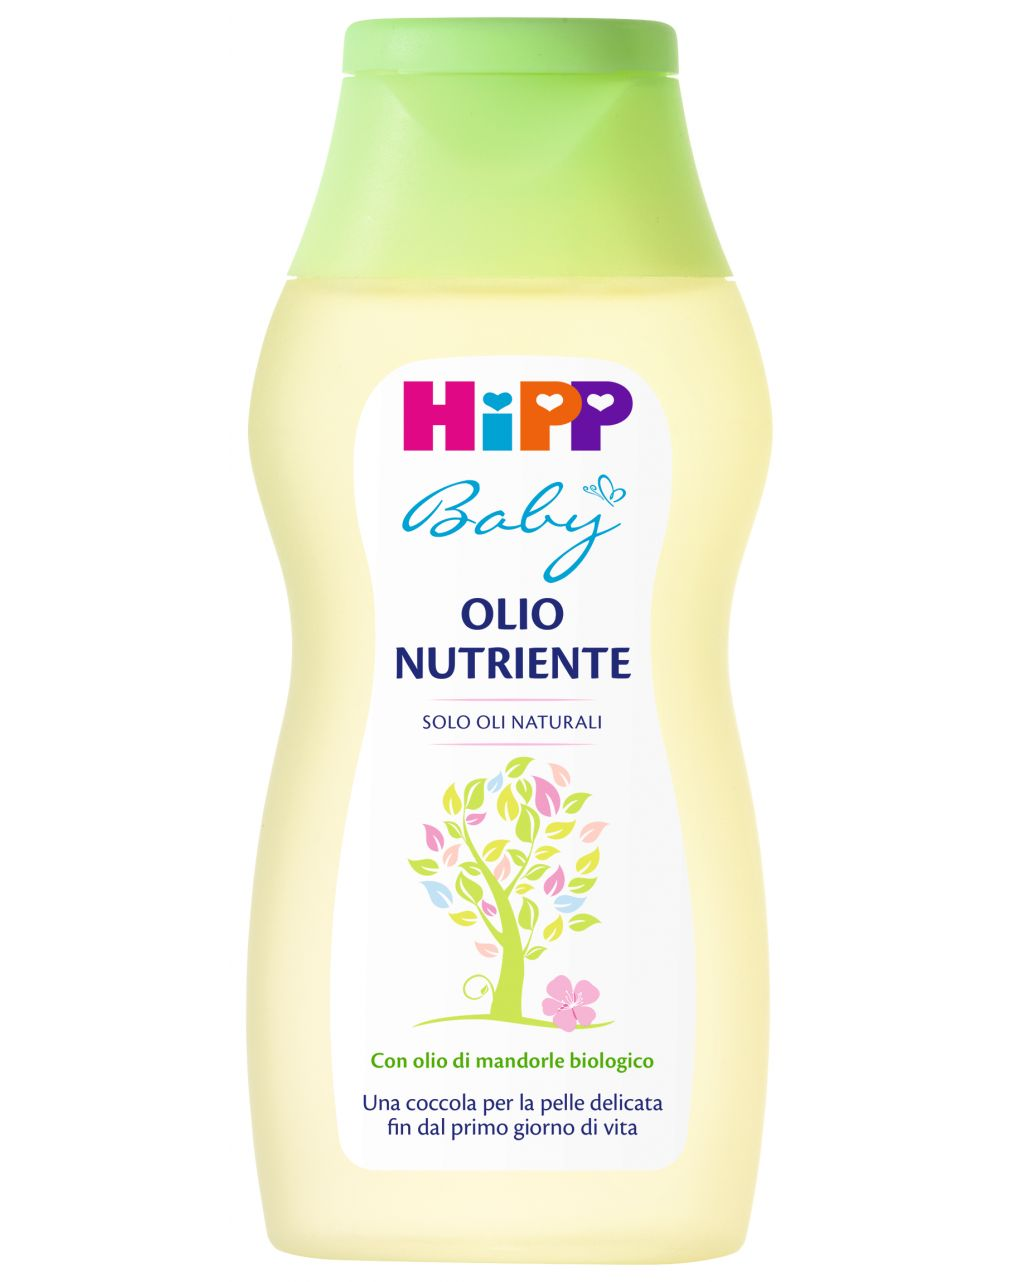 Olio nutriente 200 ml - Hipp